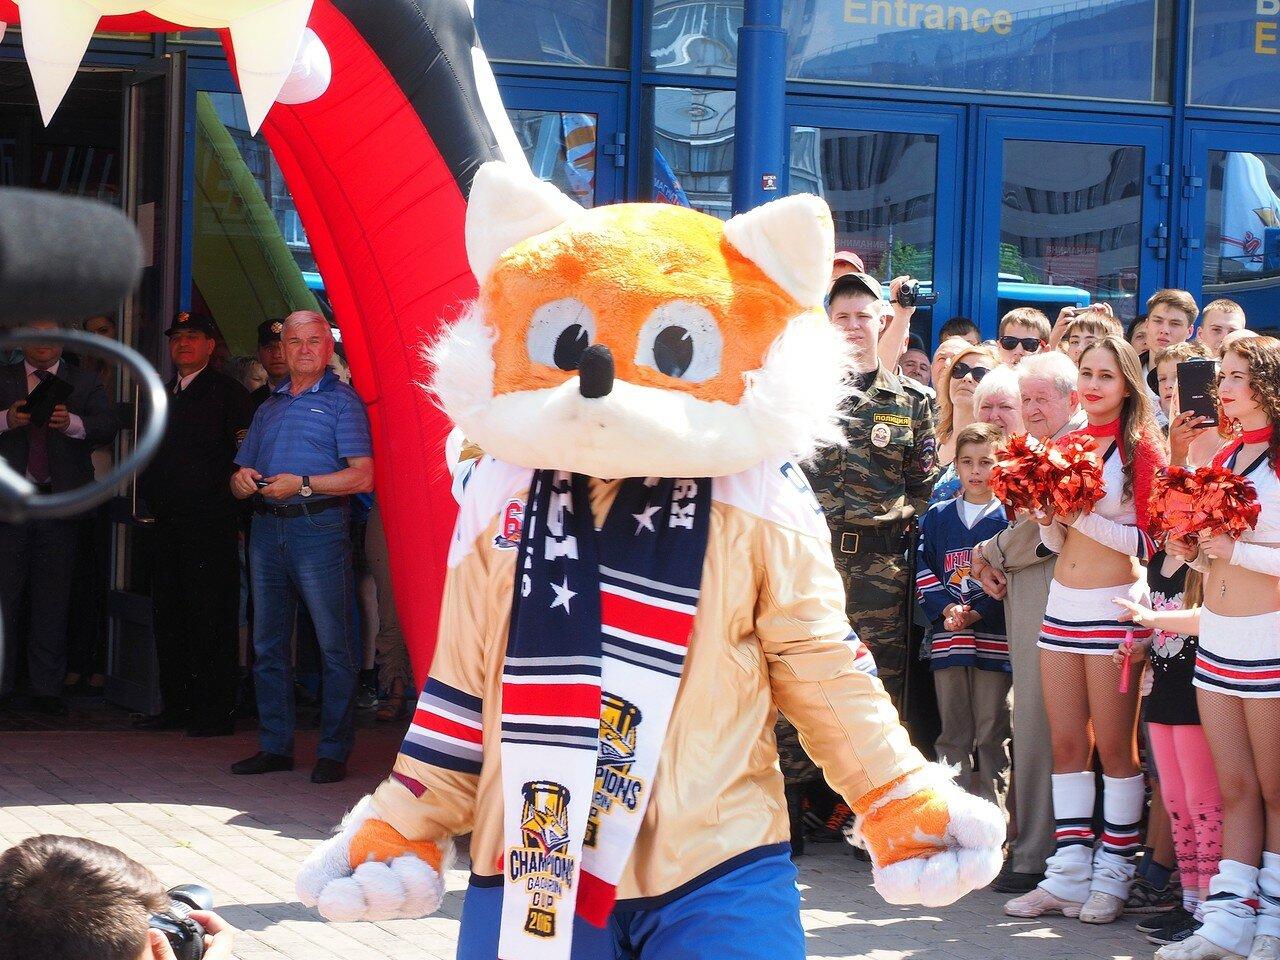 88Церемония чествования команды Металлург27.05.2016